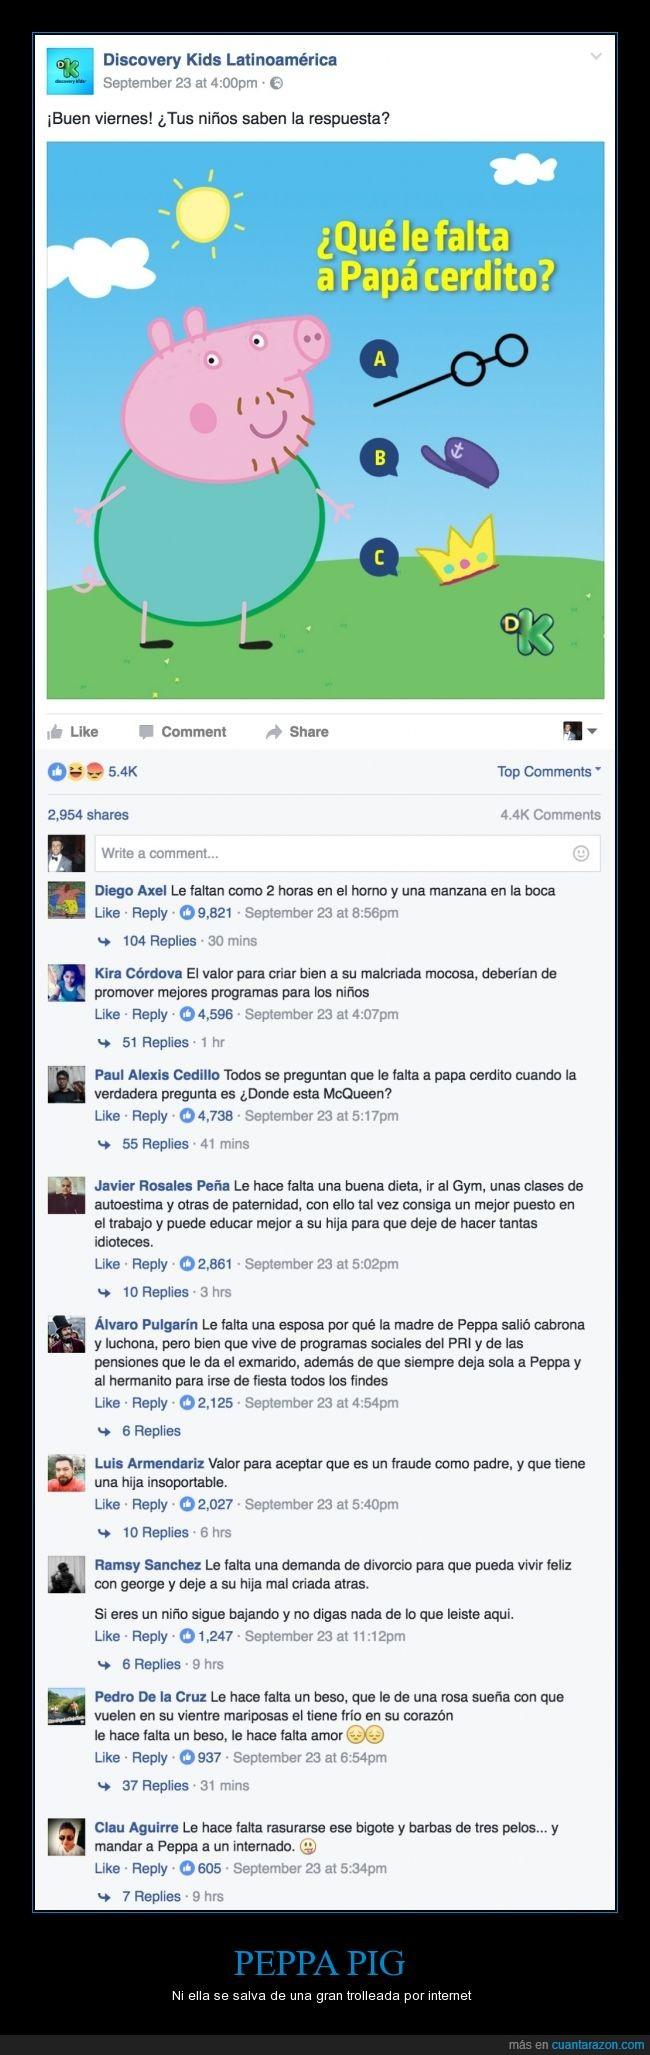 comentarios,discovery kids,facebook,peppa pig,trolls